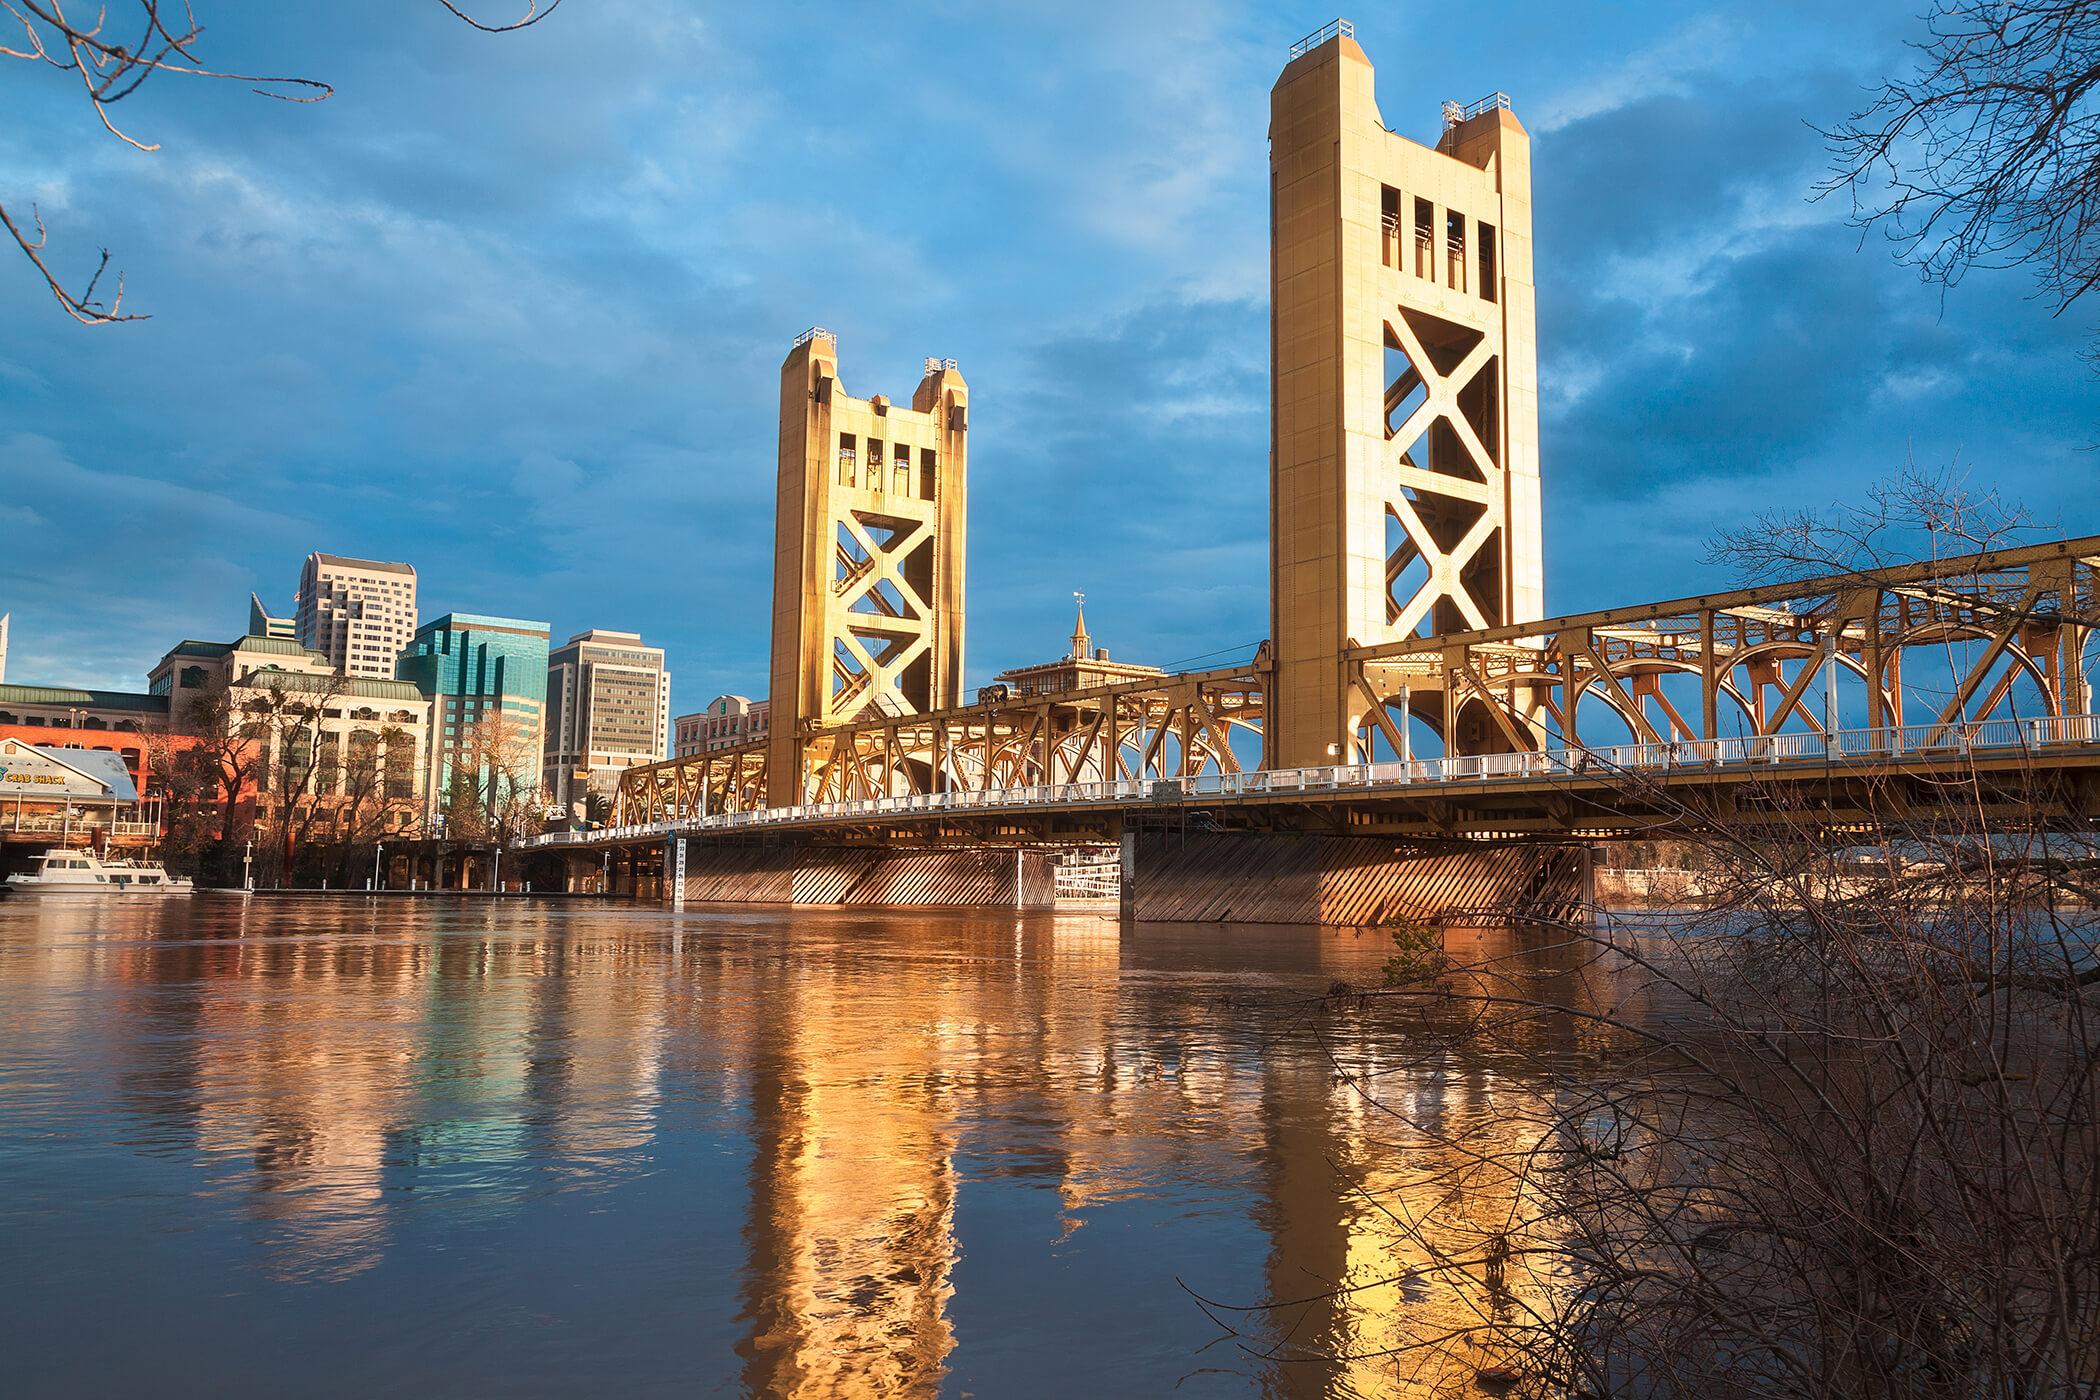 Sacramento-1-Lady-Bird-movie-travel-blog-via-magazine.jpg